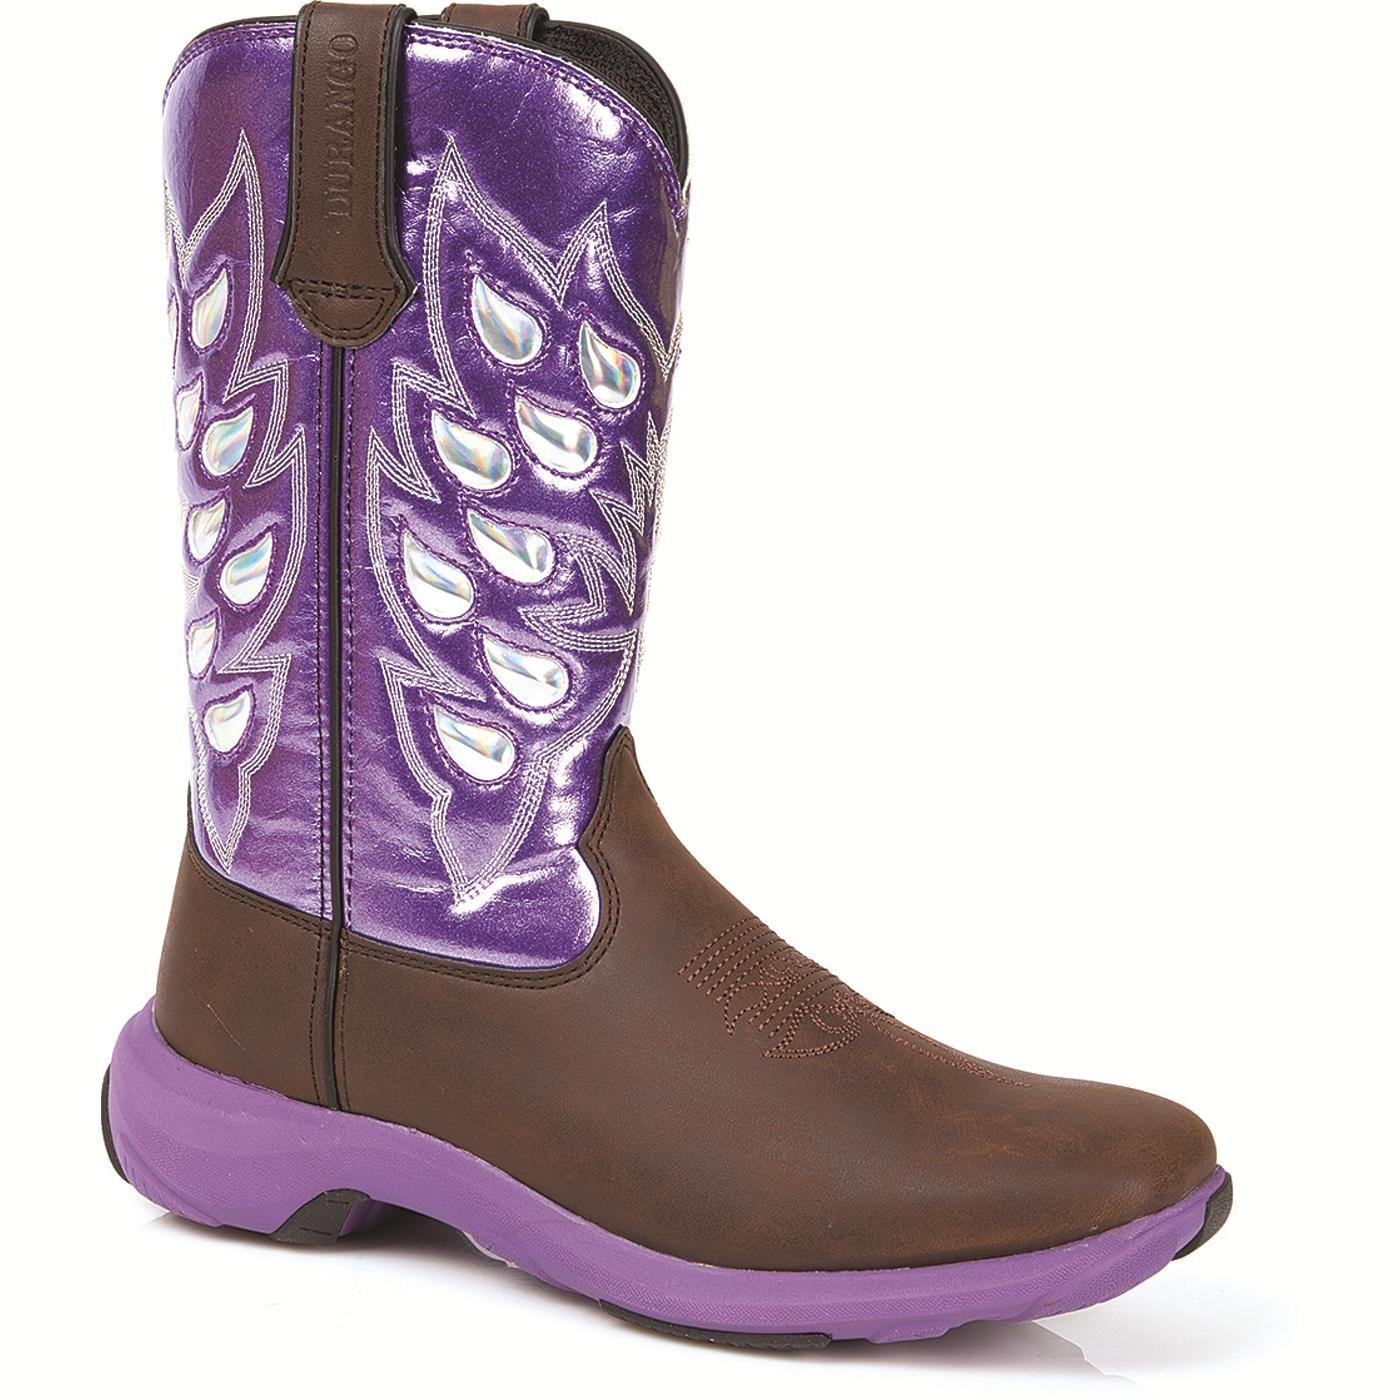 um, purple soles? Durango Women's Rebelicious Flutter Western Boot (Style #DWRD003 - Durango Boot Company